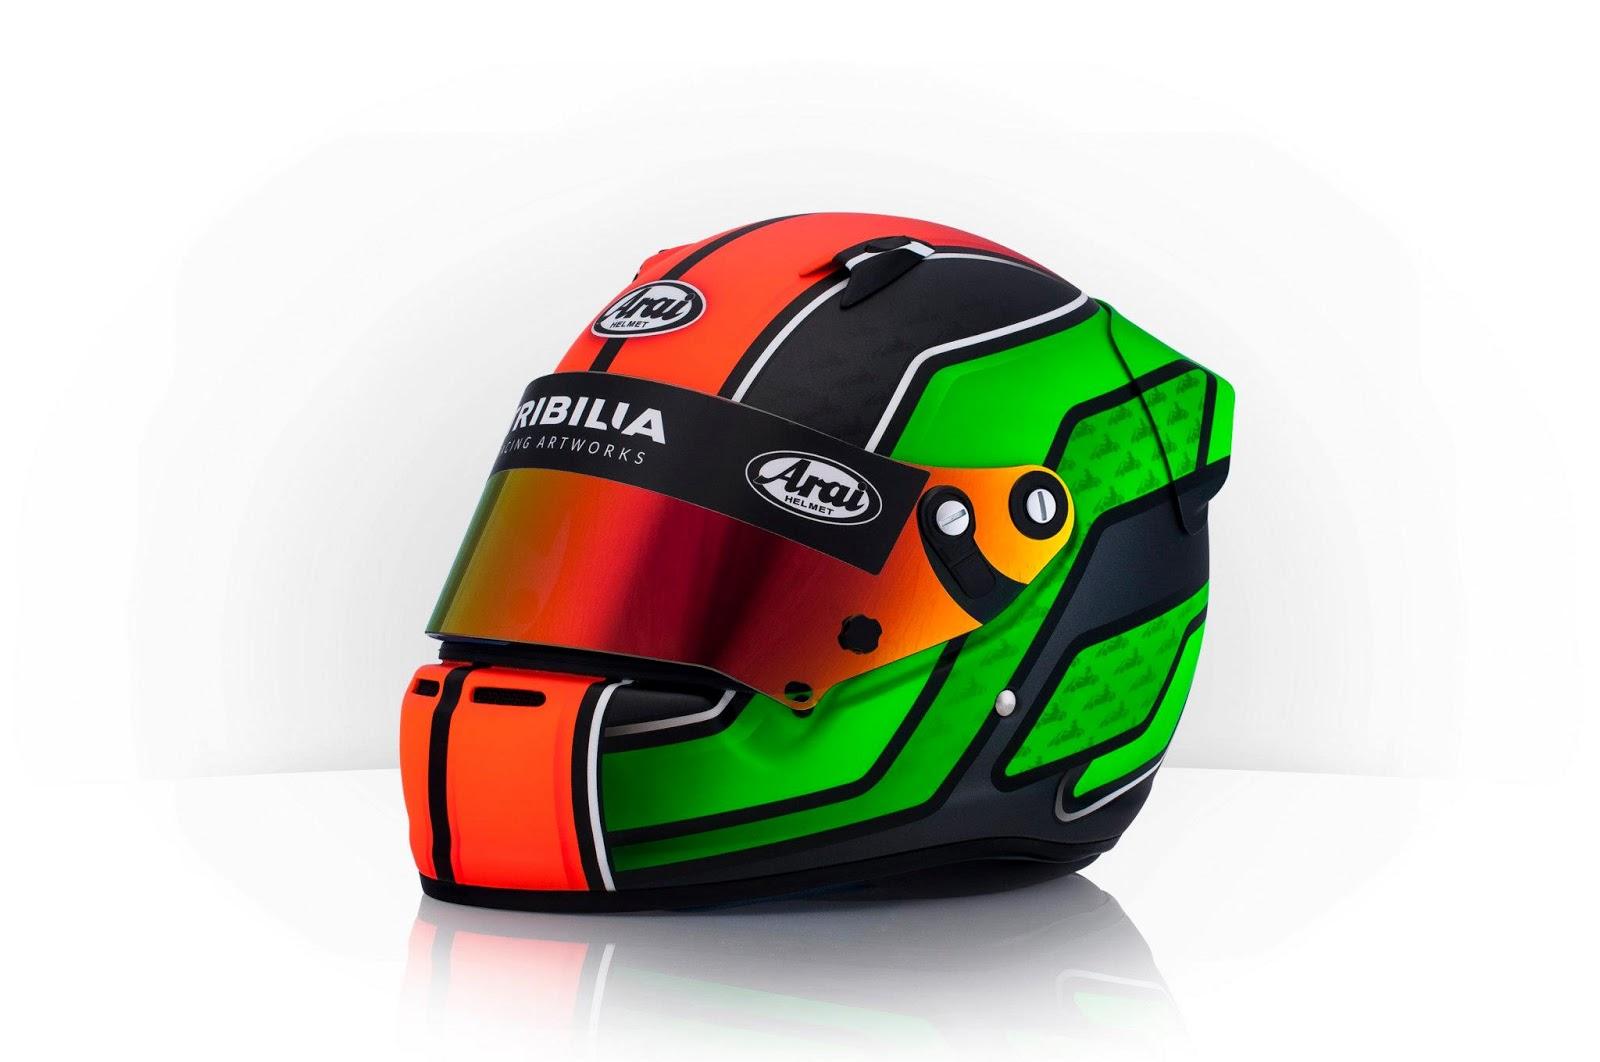 Helm Design racing helmets garage arai sk 5 k leesma 2013 by tribilia design